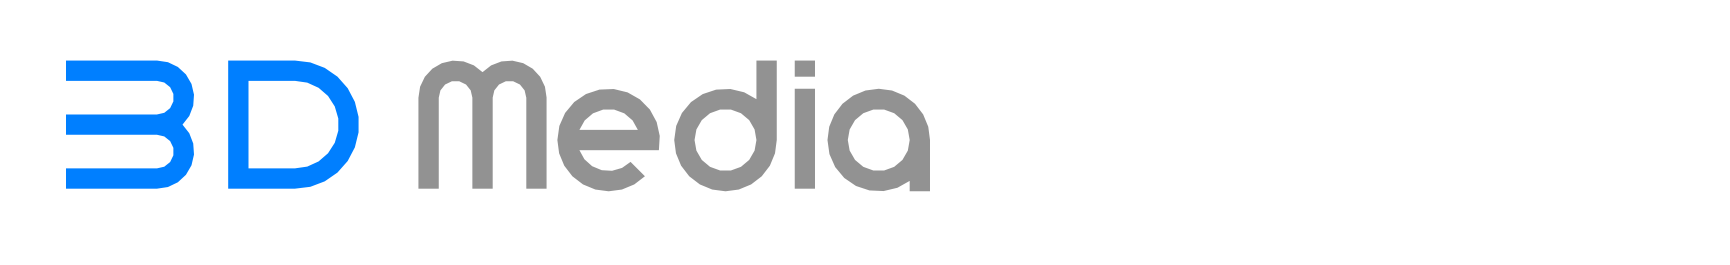 3D Media Design